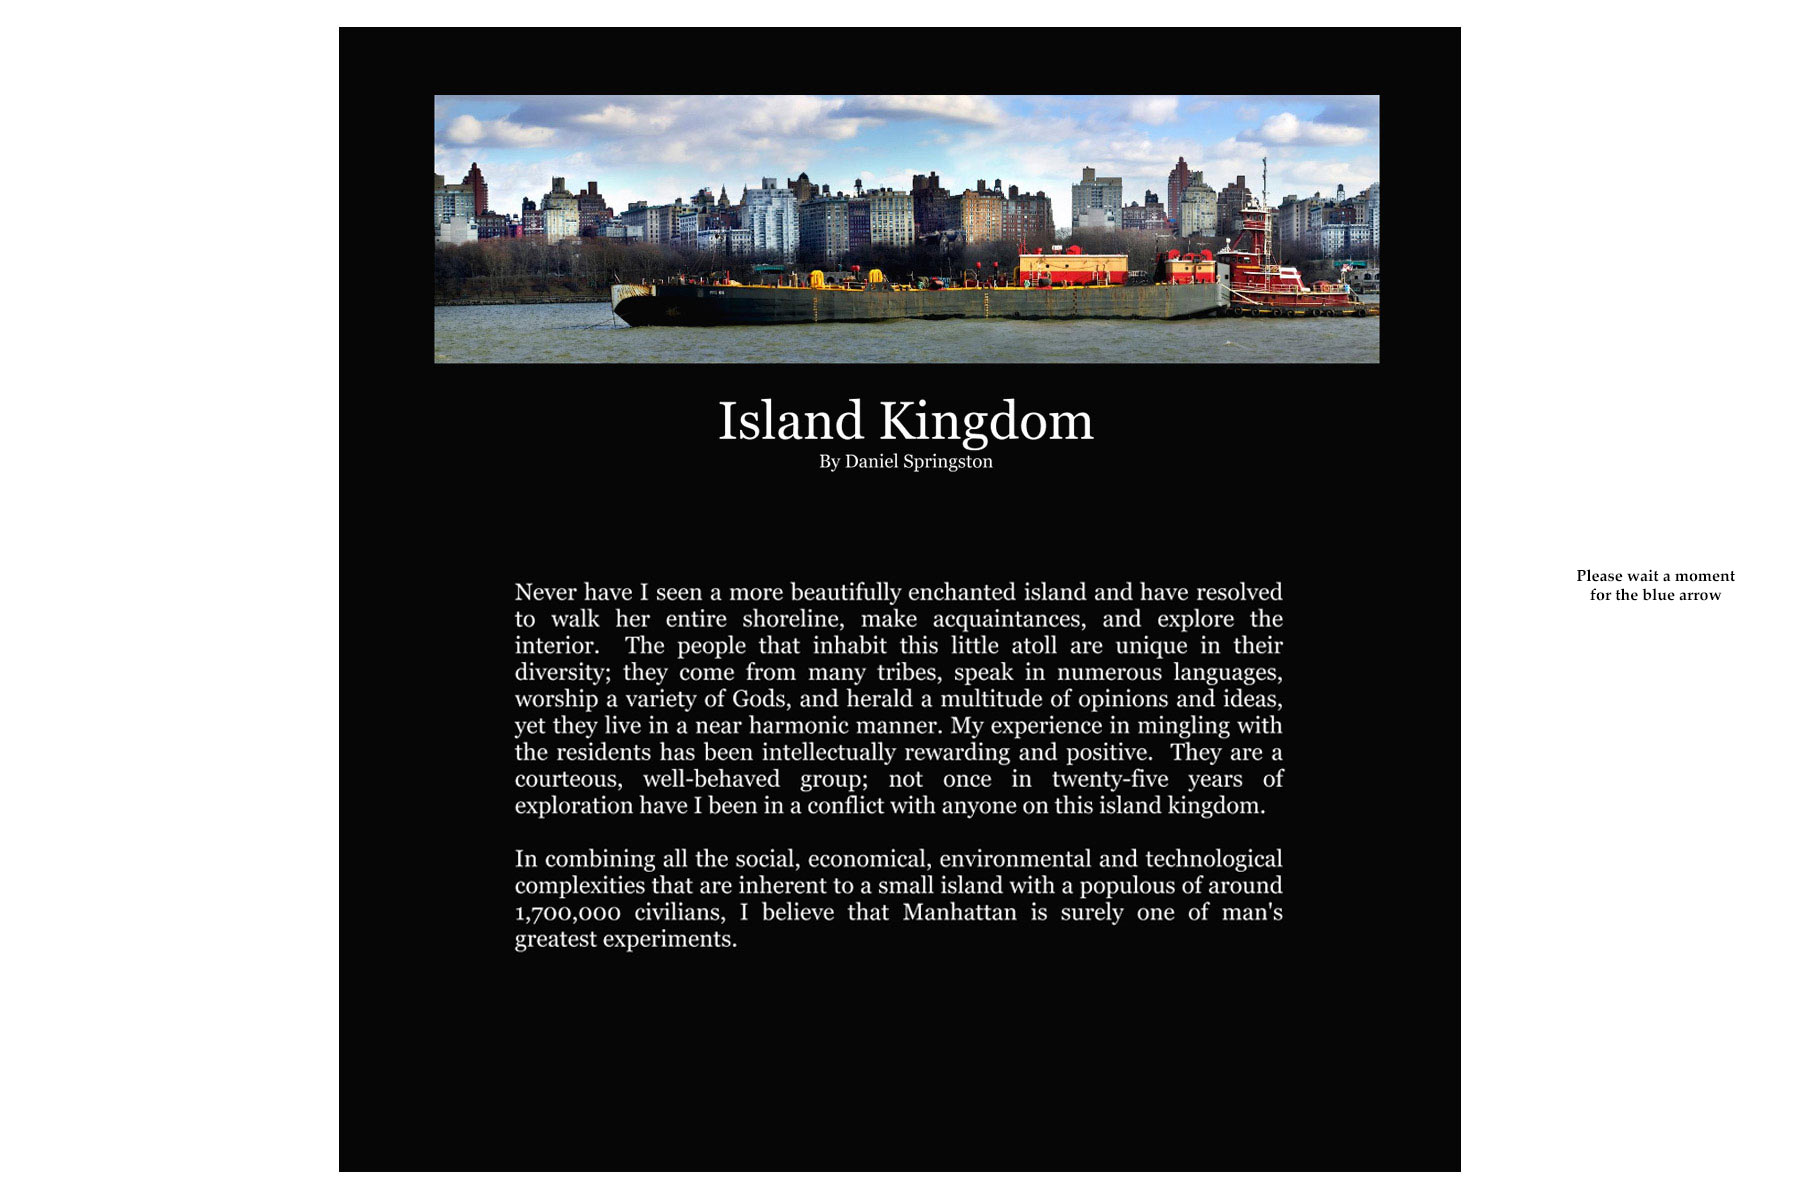 Island-Kingdom-Naration1.jpg